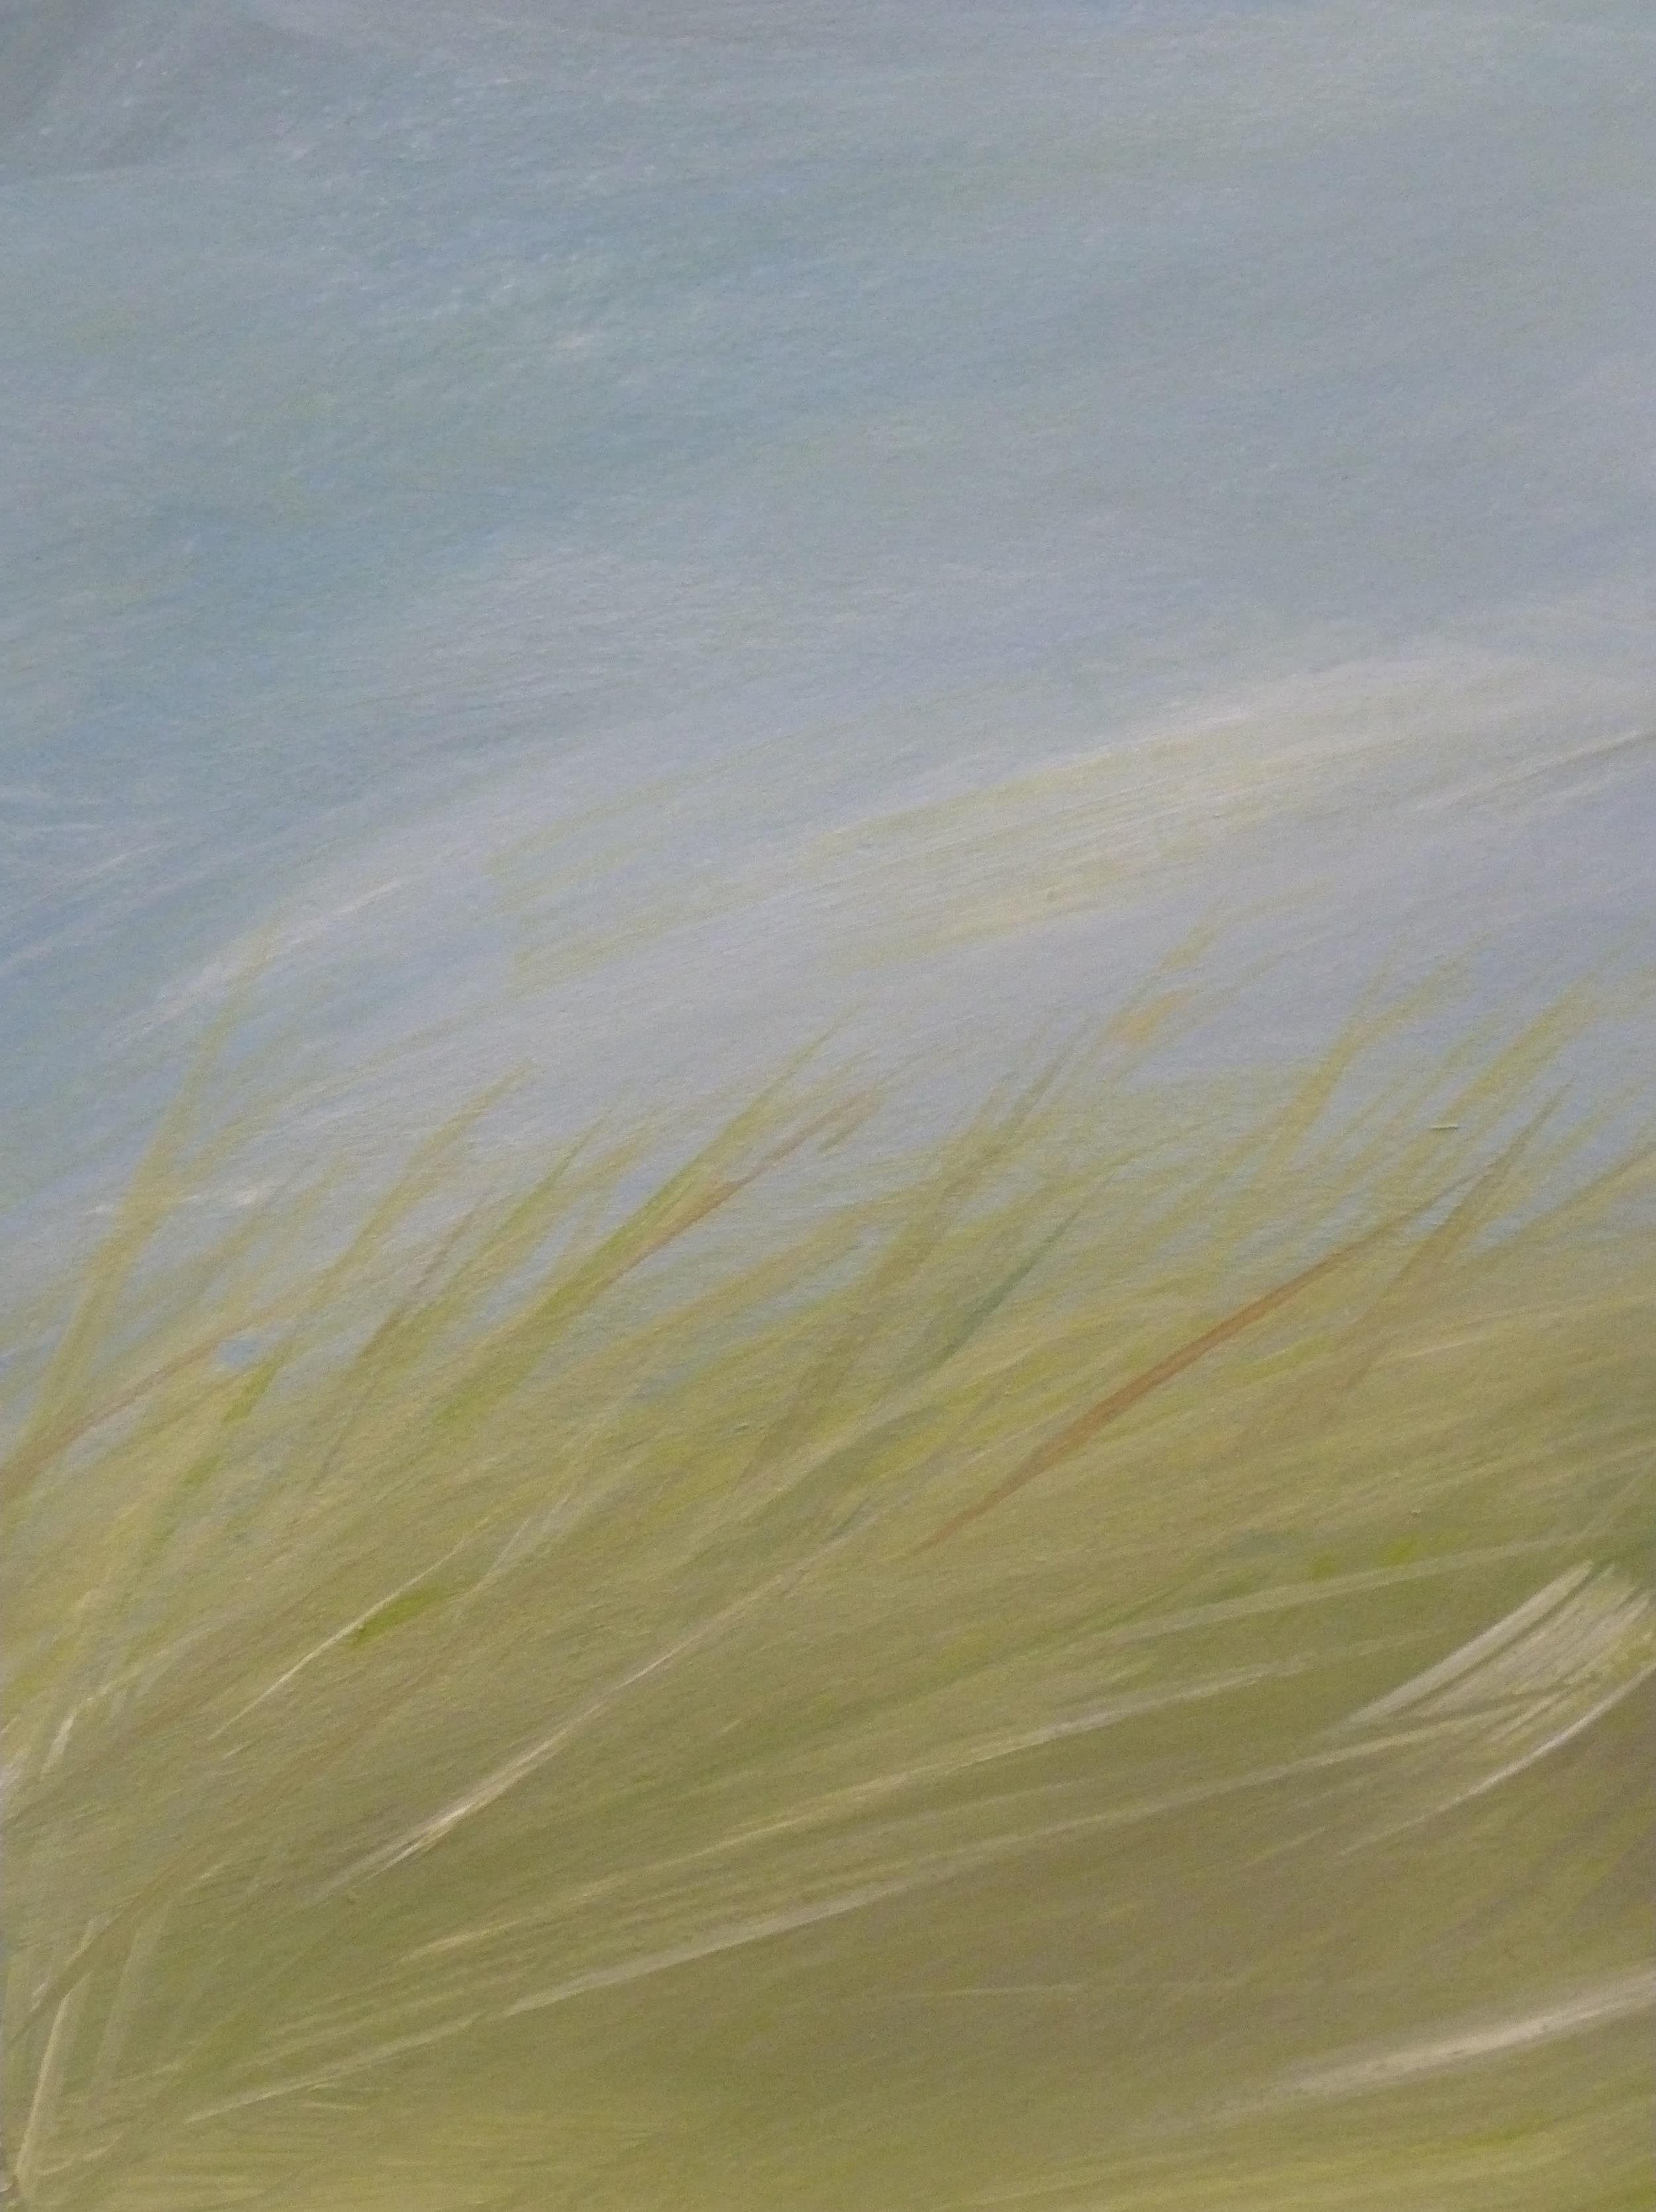 clifftop grasses